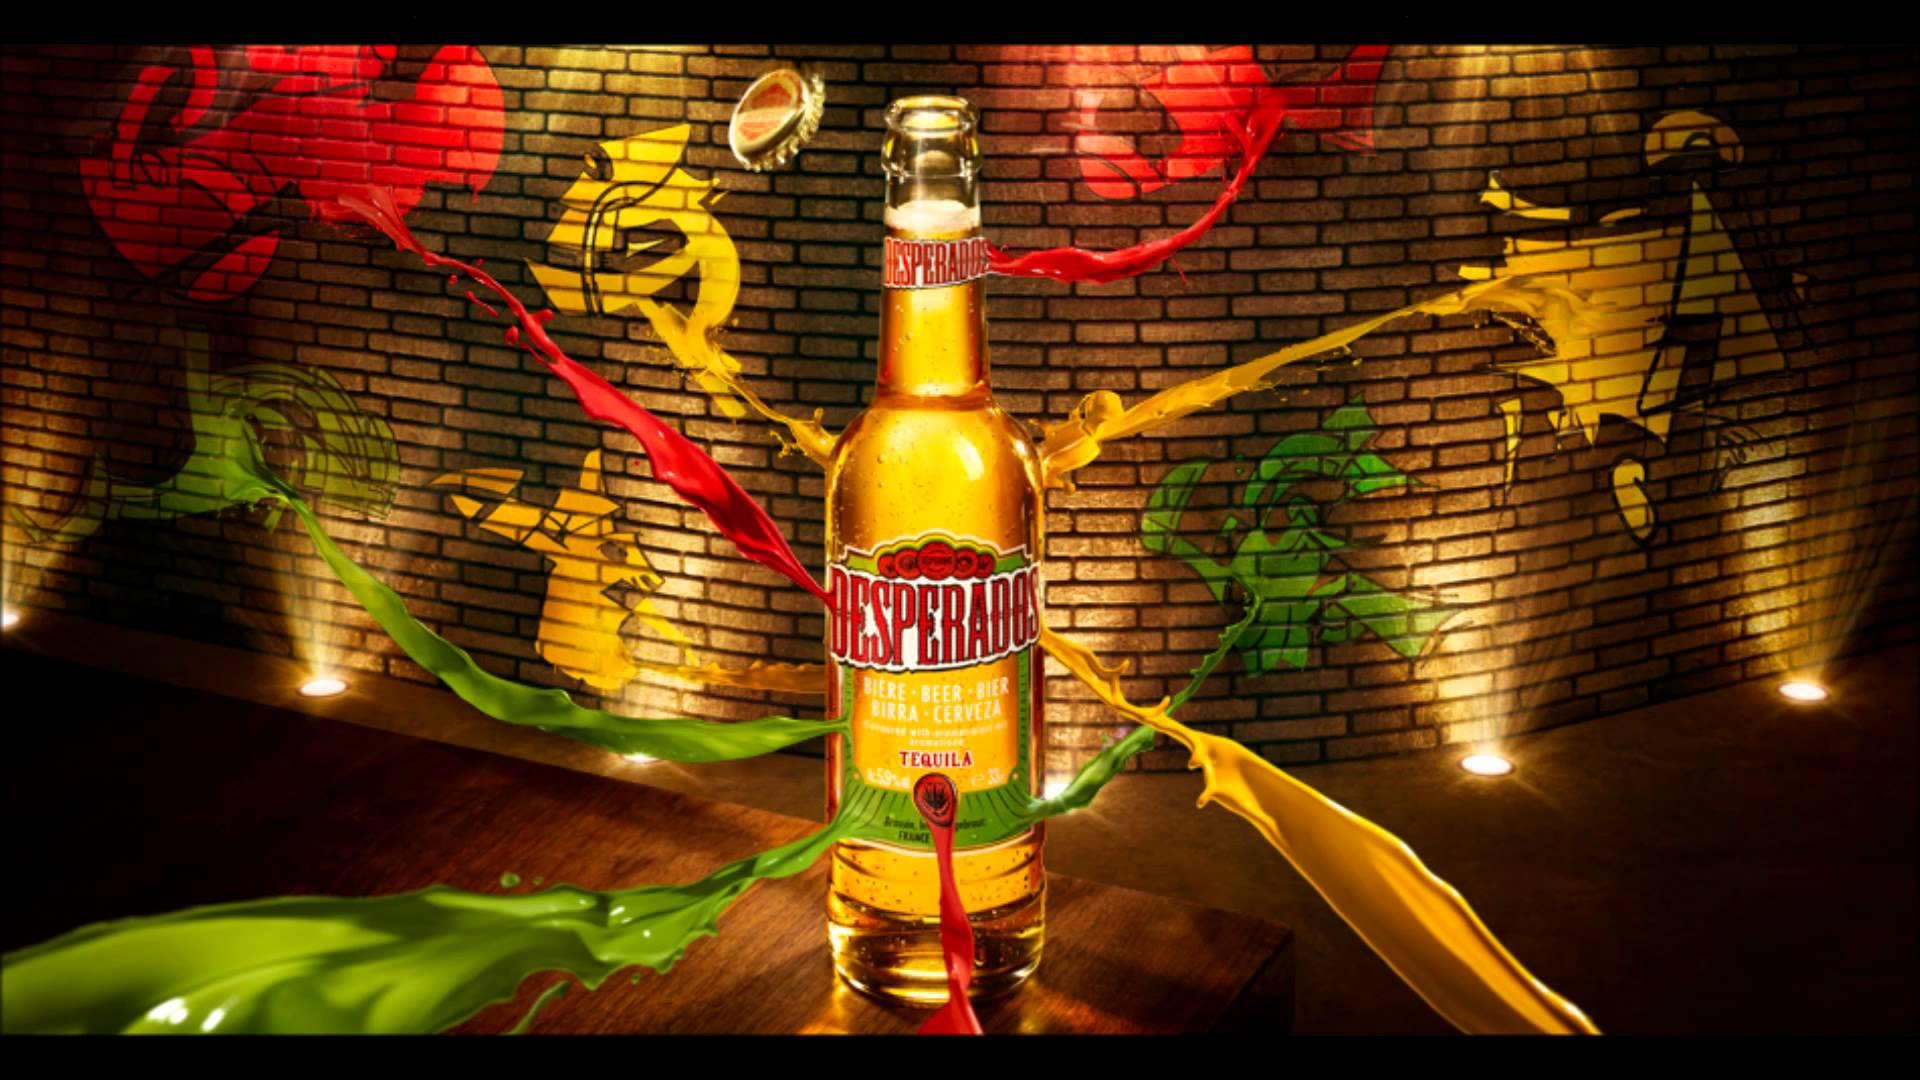 Casino Rooms'Official Bottled Beer Partner.Click the bottle to visit theDesperados Website! -